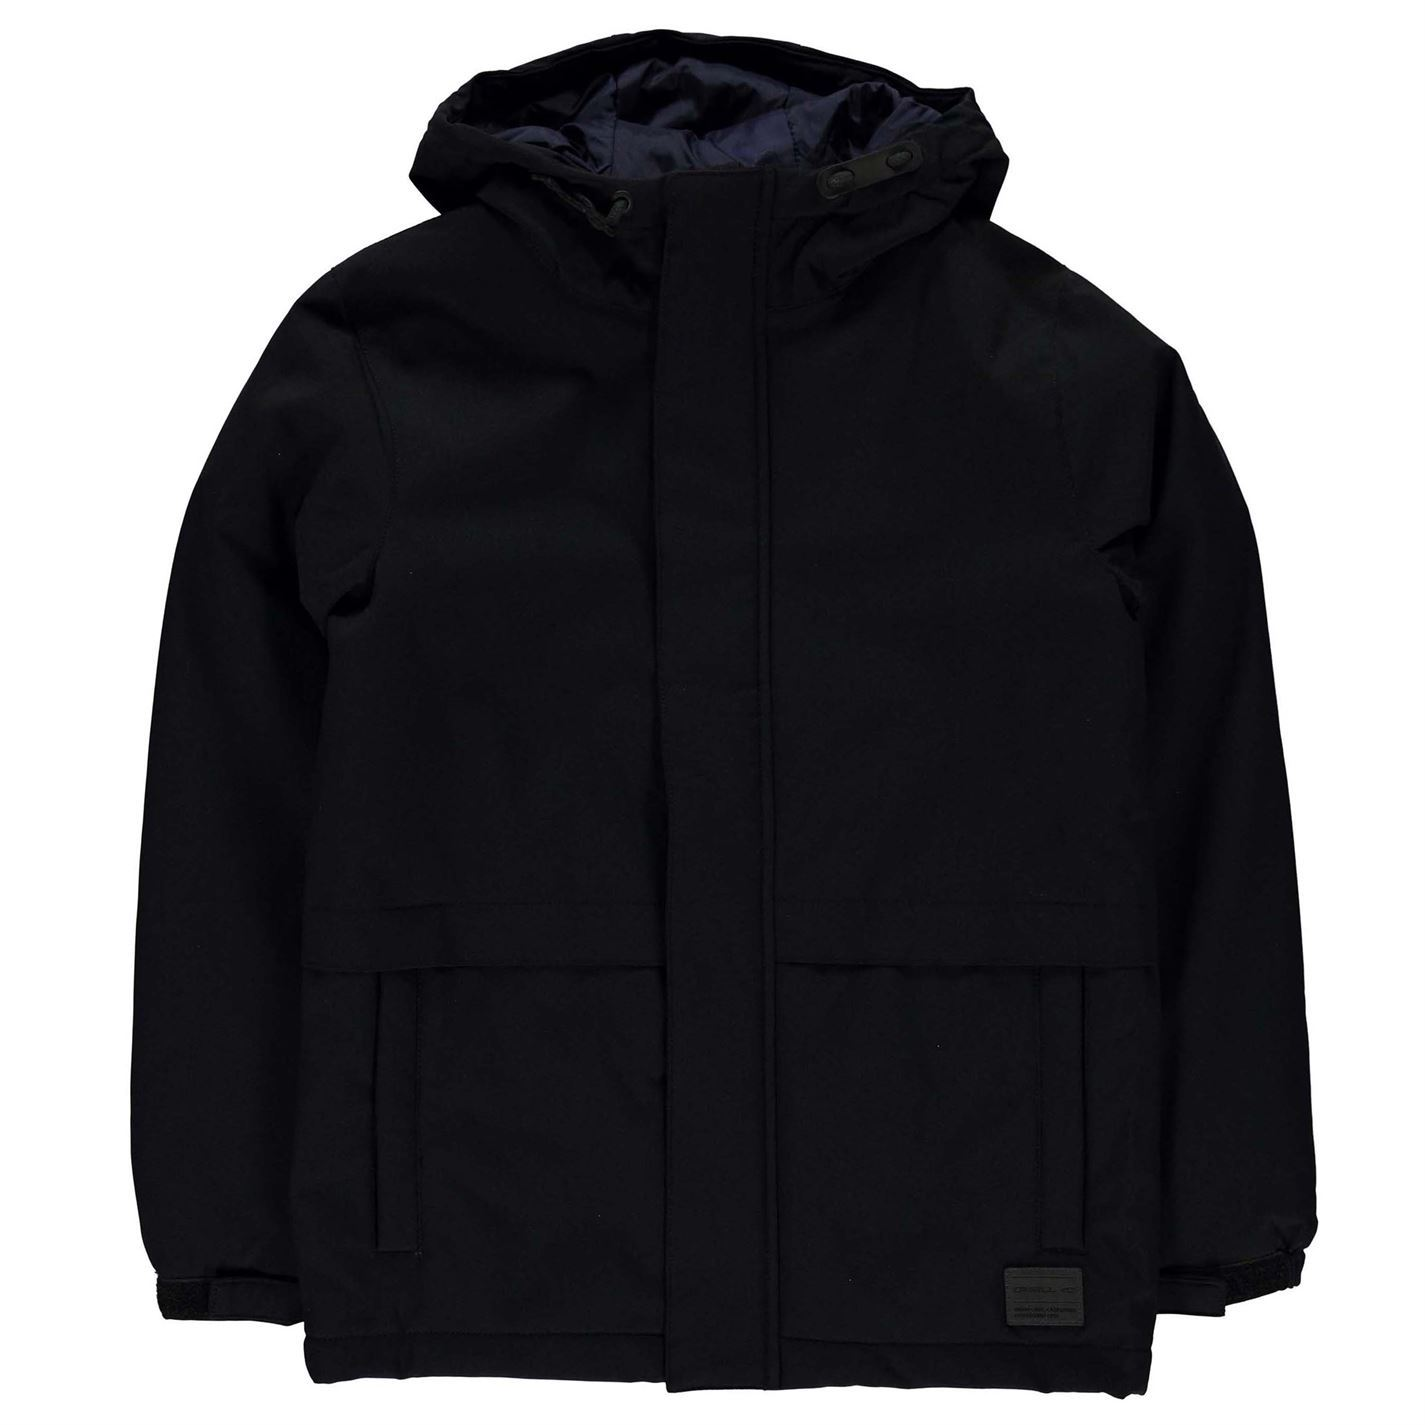 ONeill Kids Boys LB Jacket Padded Coat Top Long Sleeve Hooded Zip Full Button